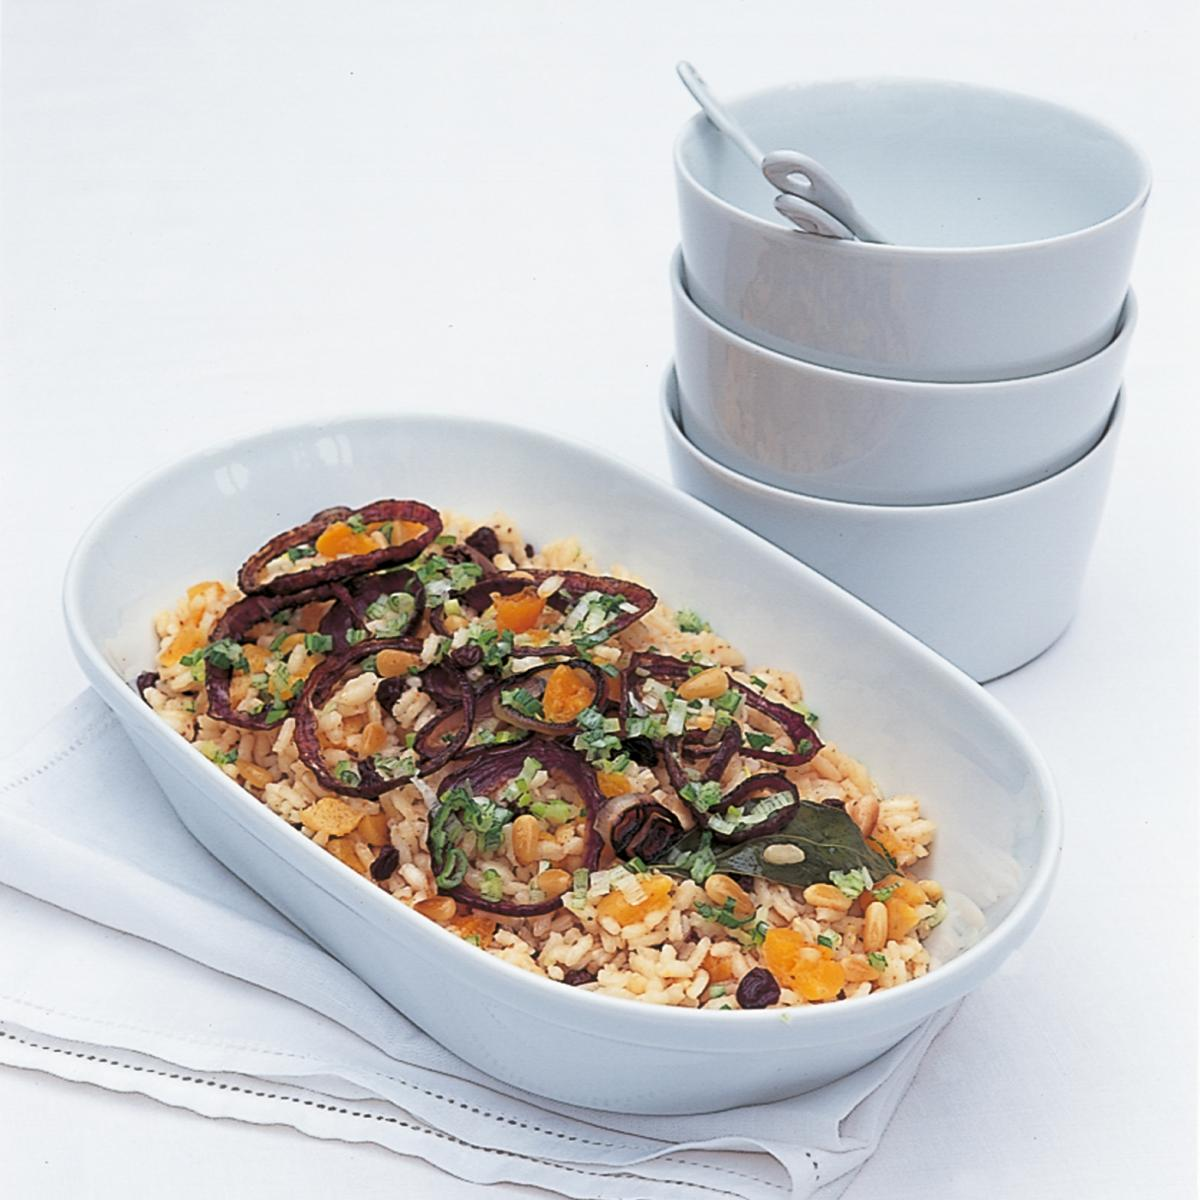 A picture of Delia's Spiced Carnaroli Rice Salad recipe